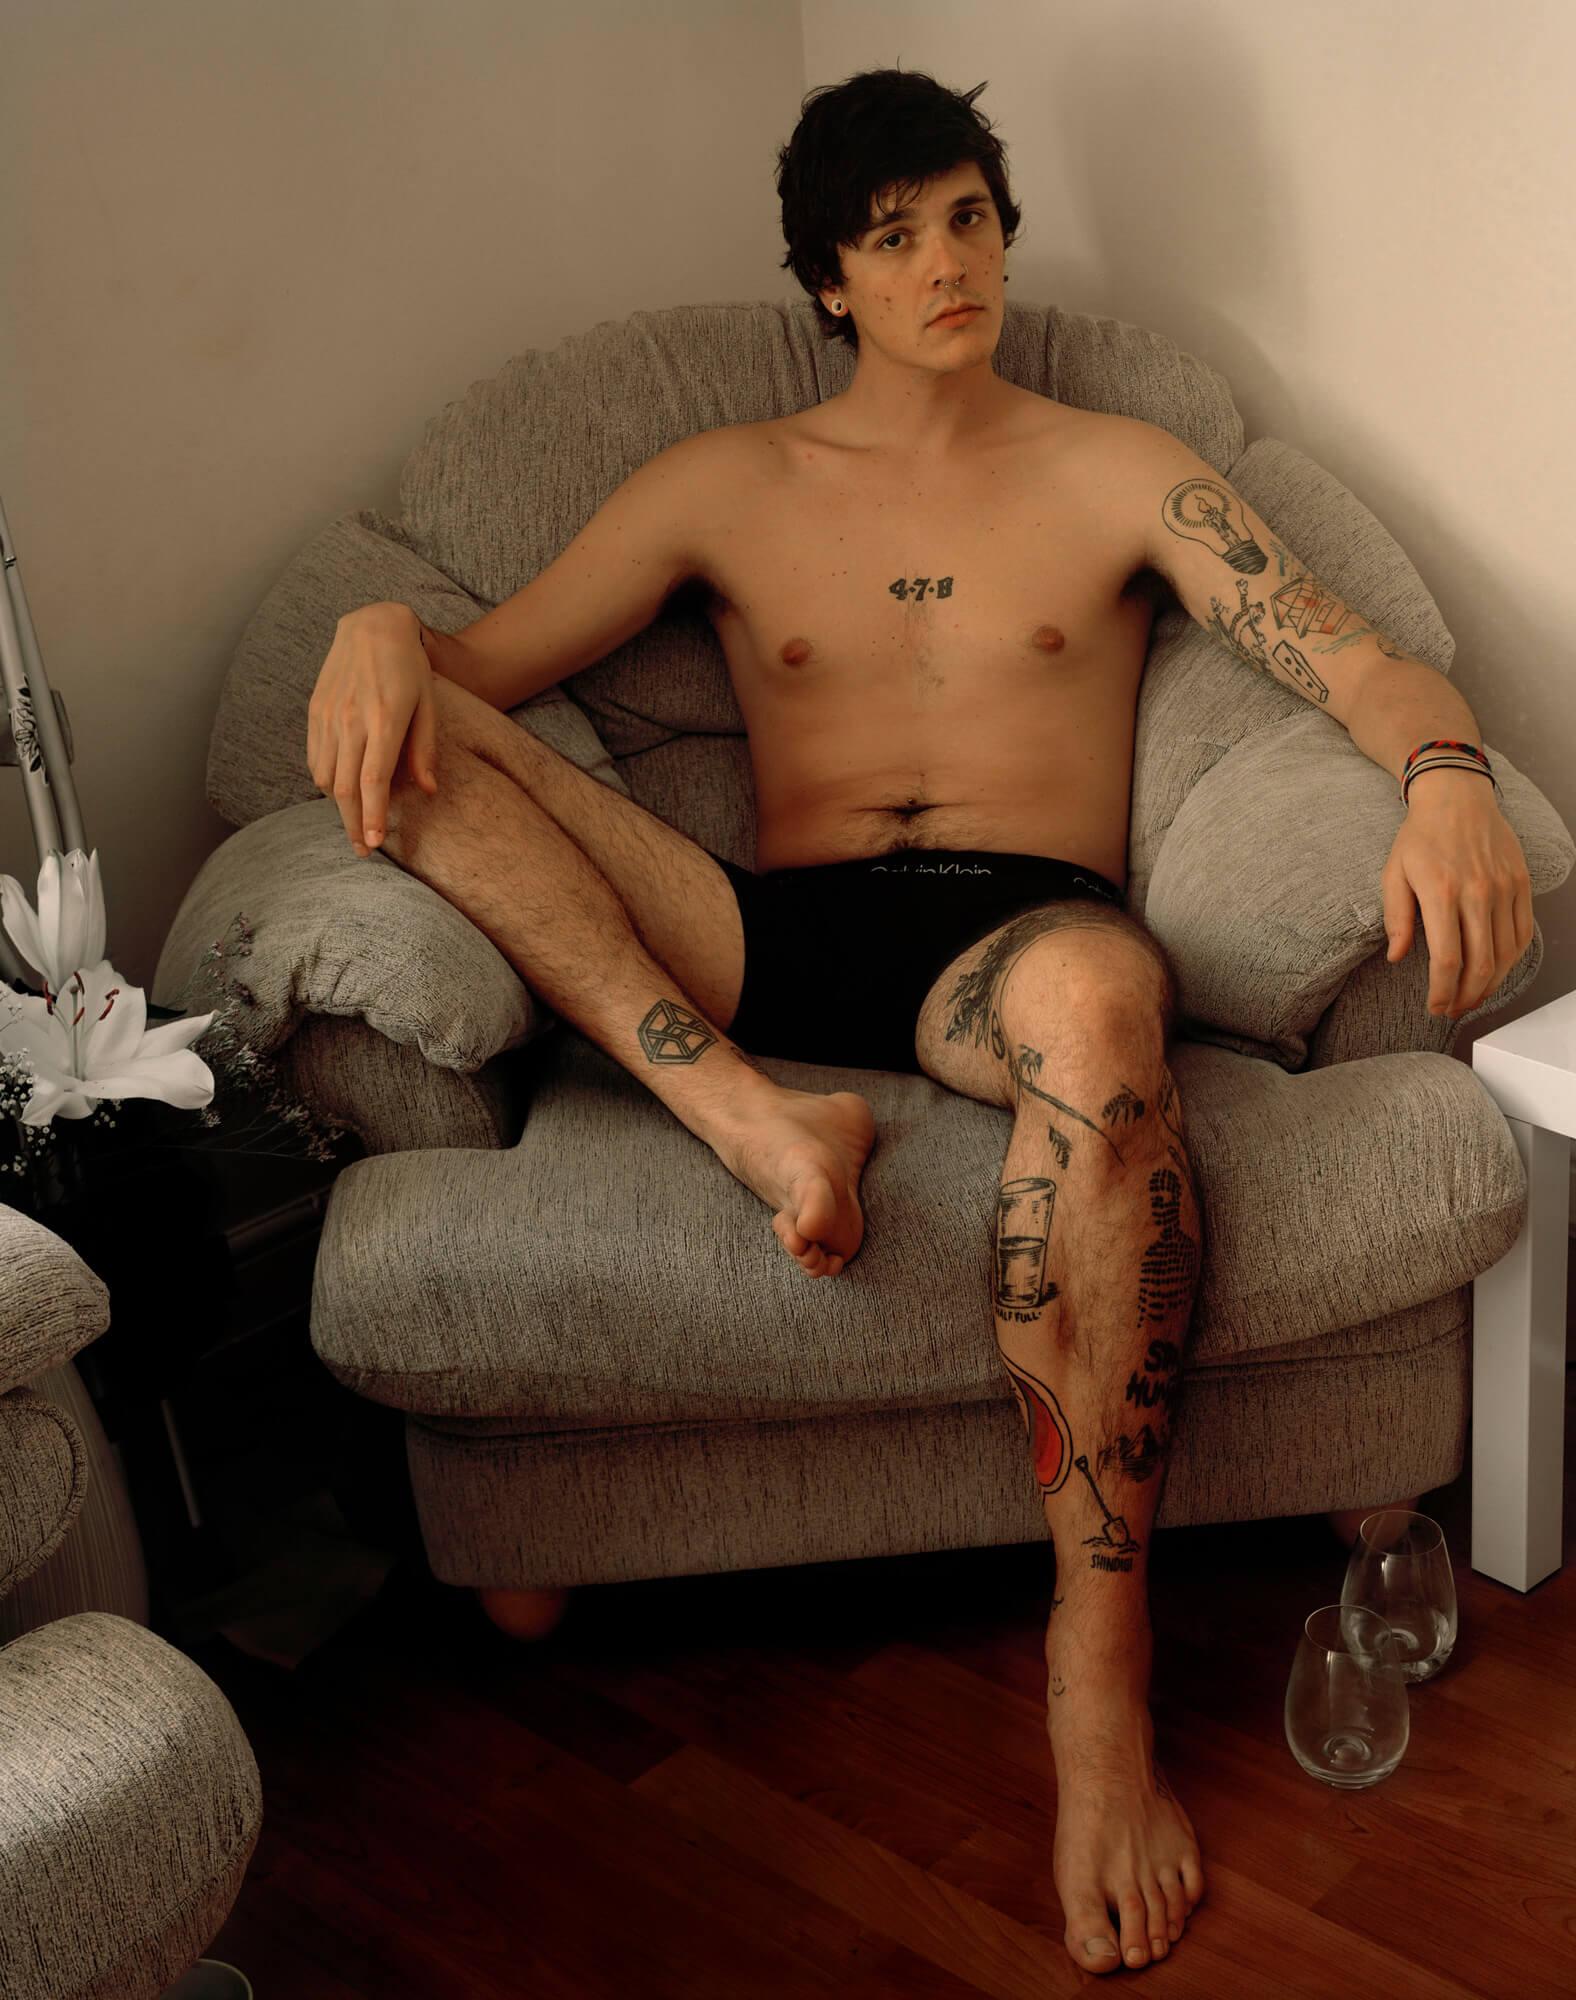 Daniel Bracken - I'm You, Just here